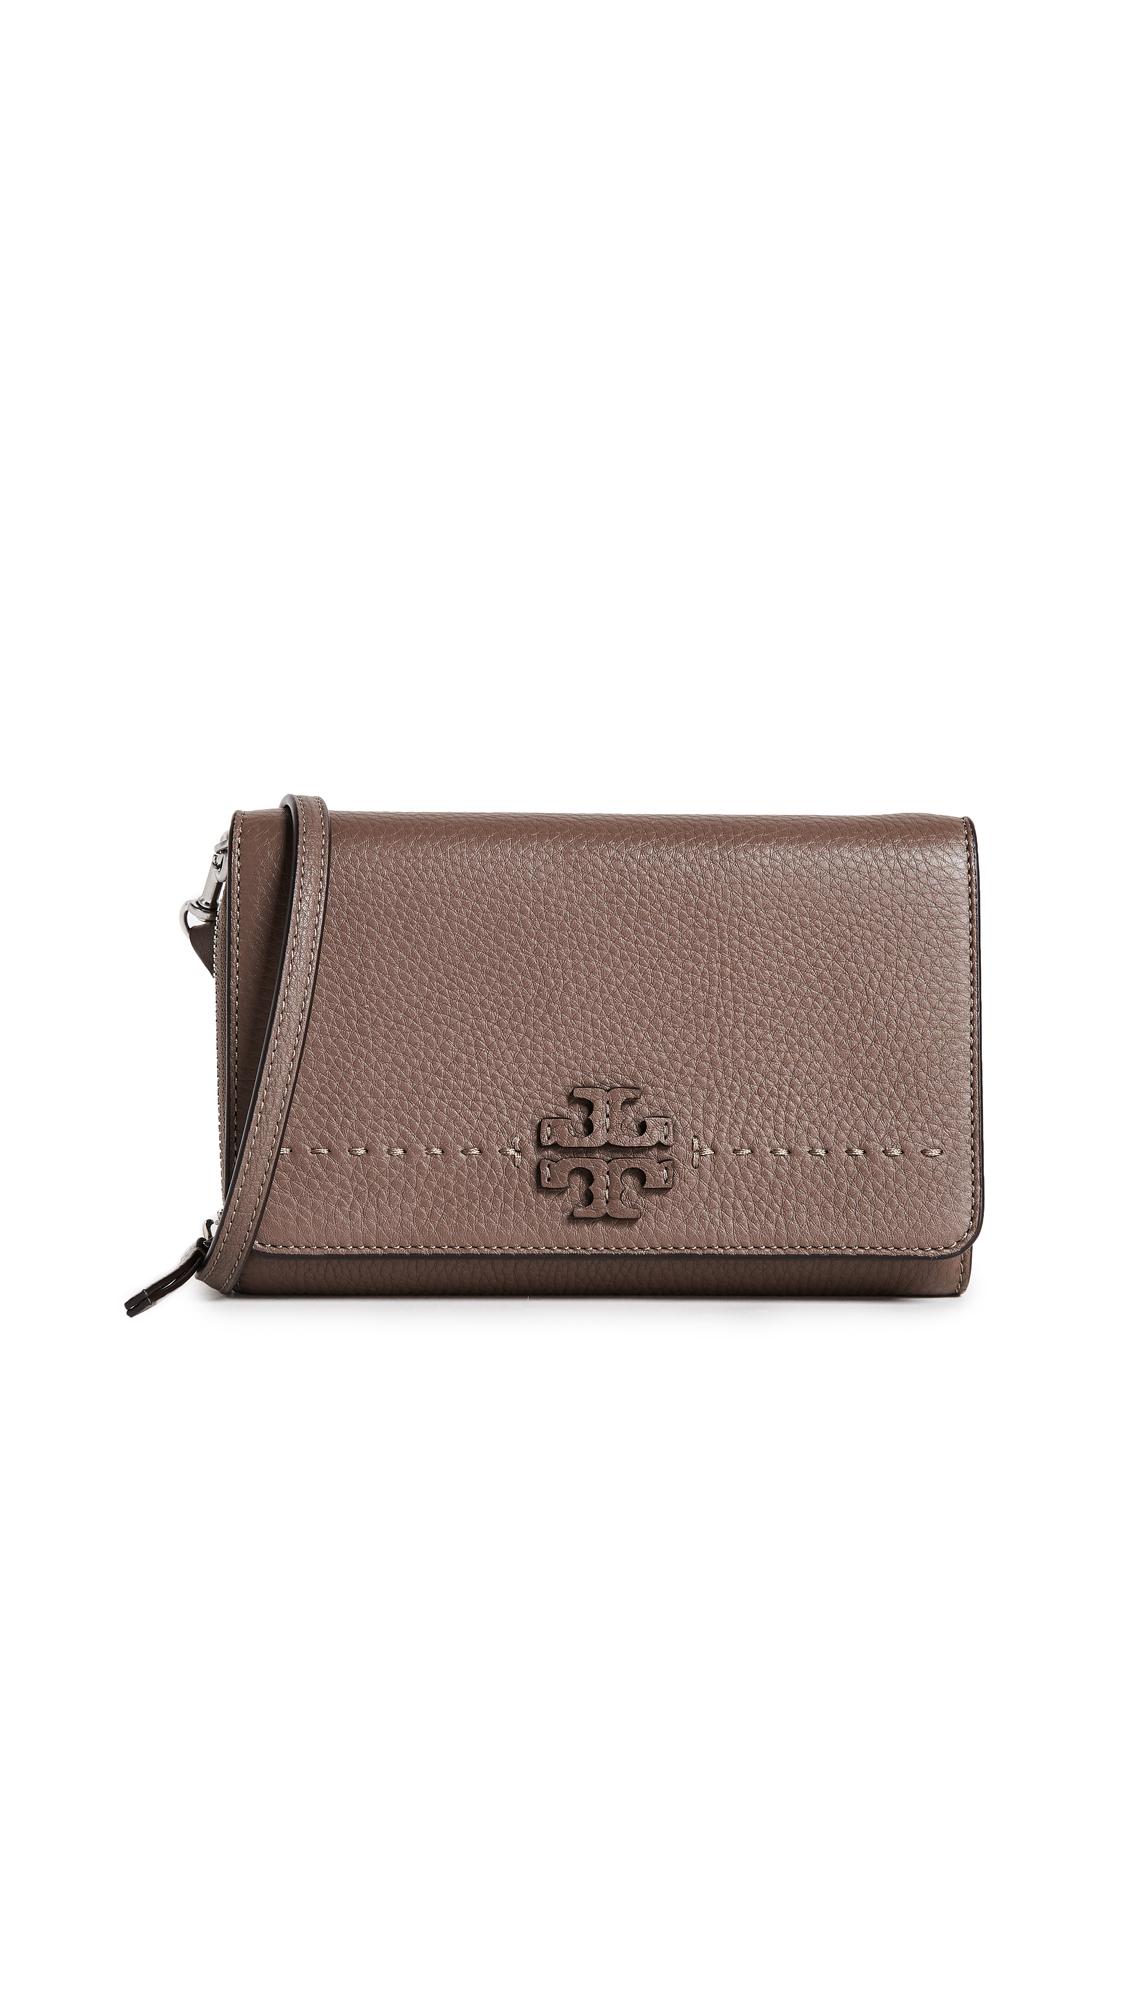 Tory Burch McGraw Flat Cross Body Bag - Silver Maple